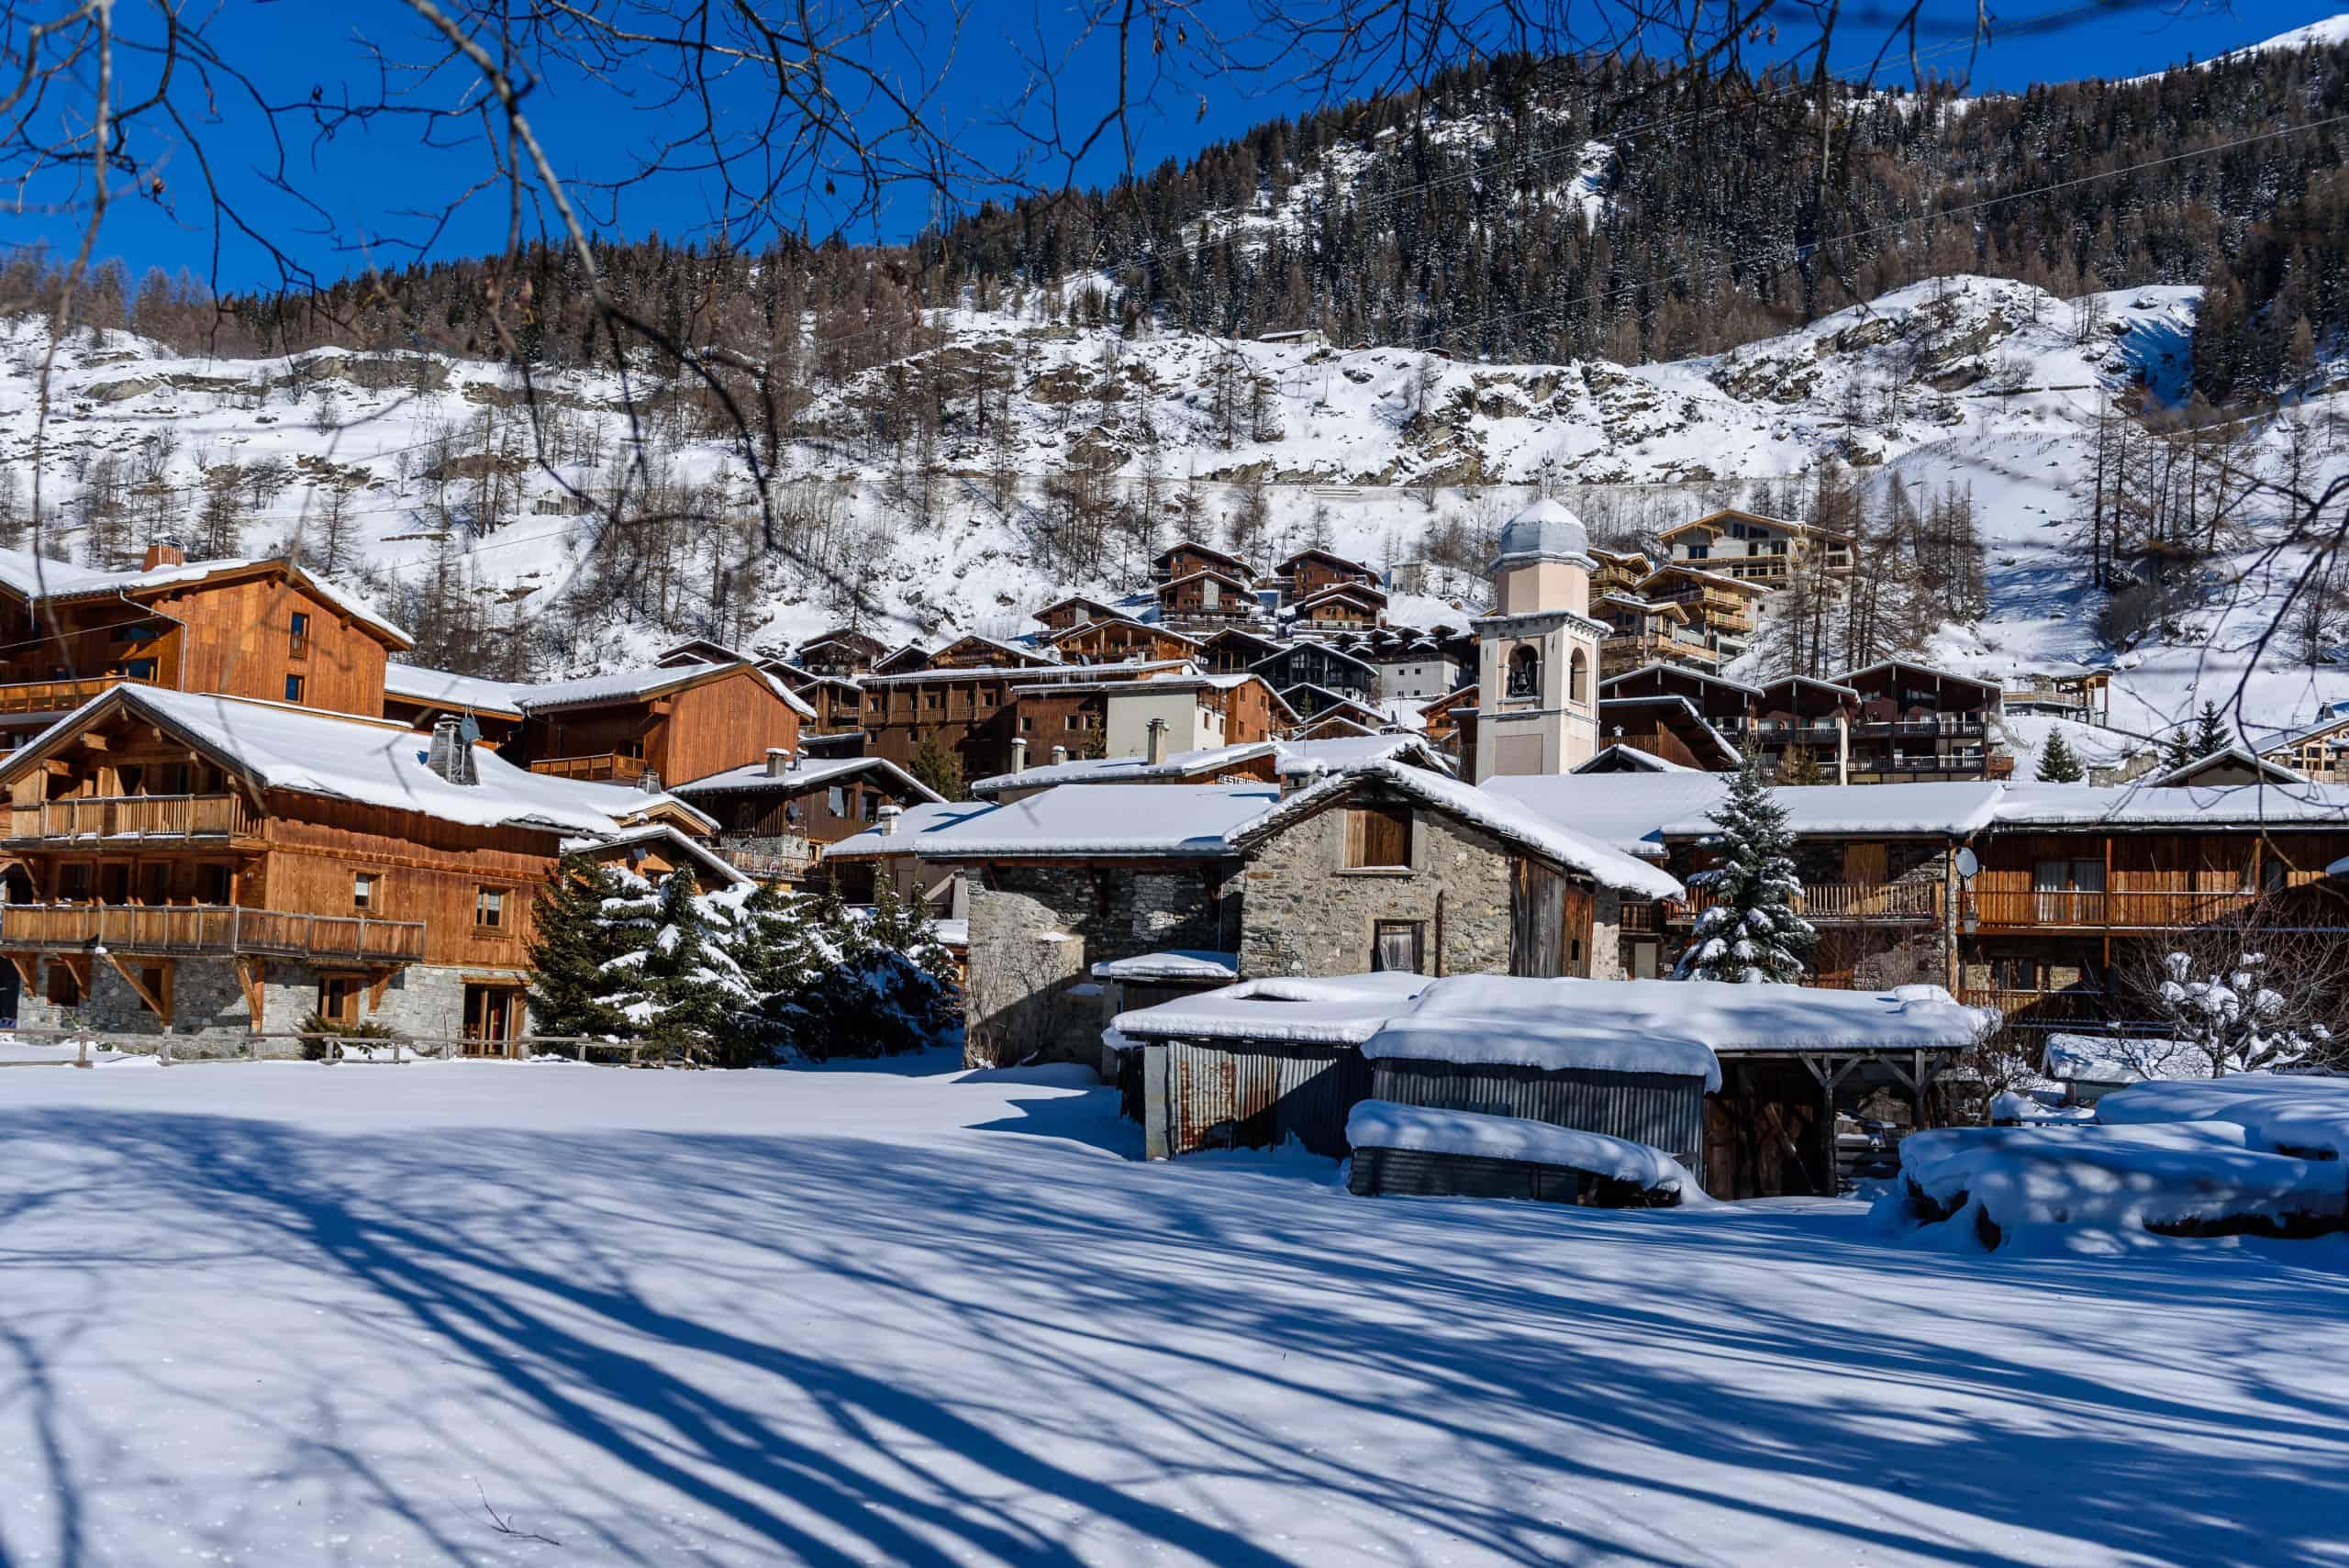 Tignes Les Brévières, la station de ski